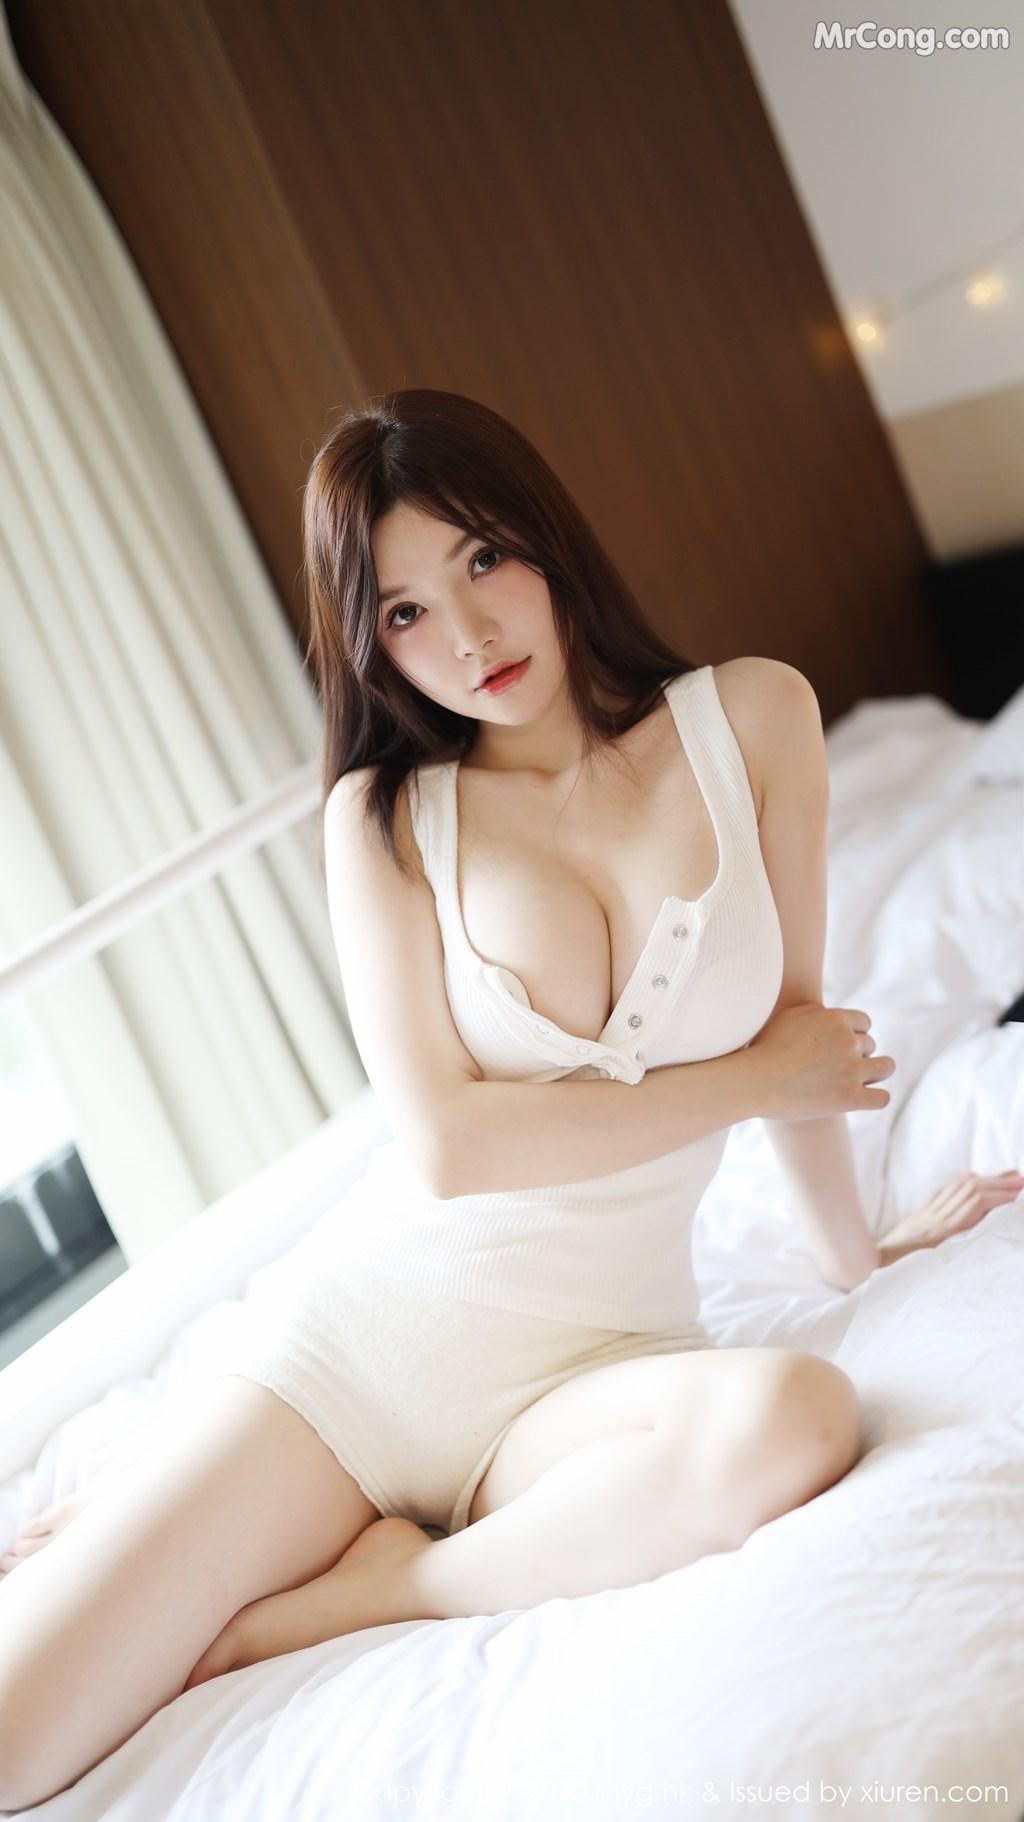 MyGirl Vol.422: 糯美子Mini (49P)